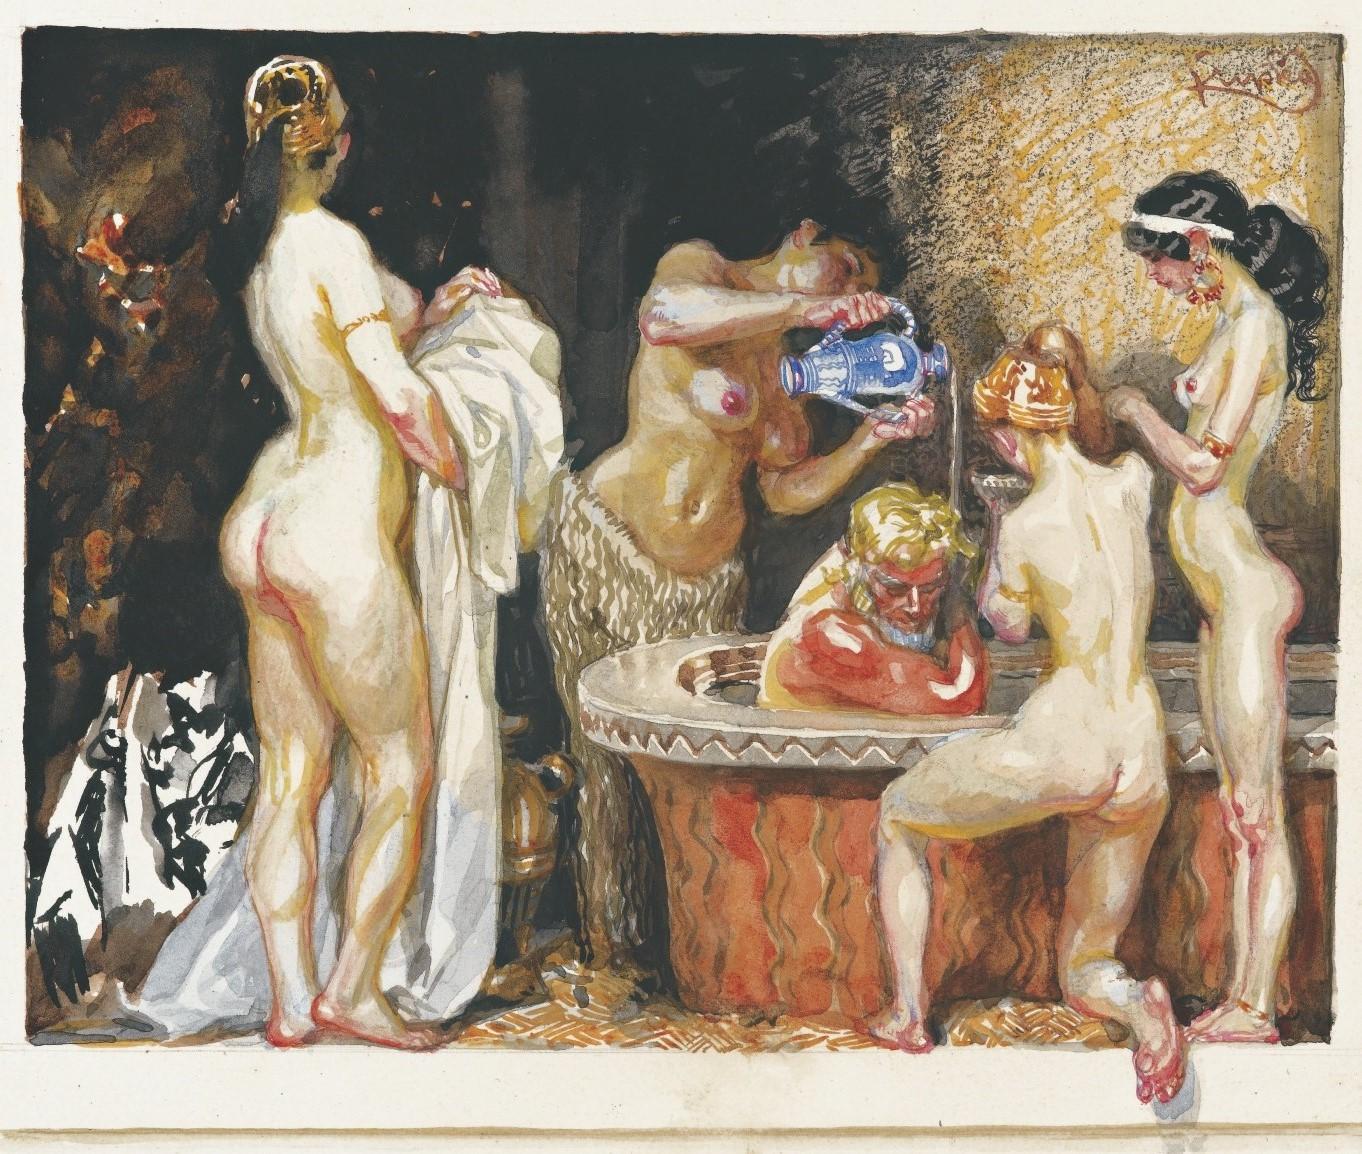 Frantisek Kupka, 1871-1957. Кассандра (16 х 19 см. Частная коллекция